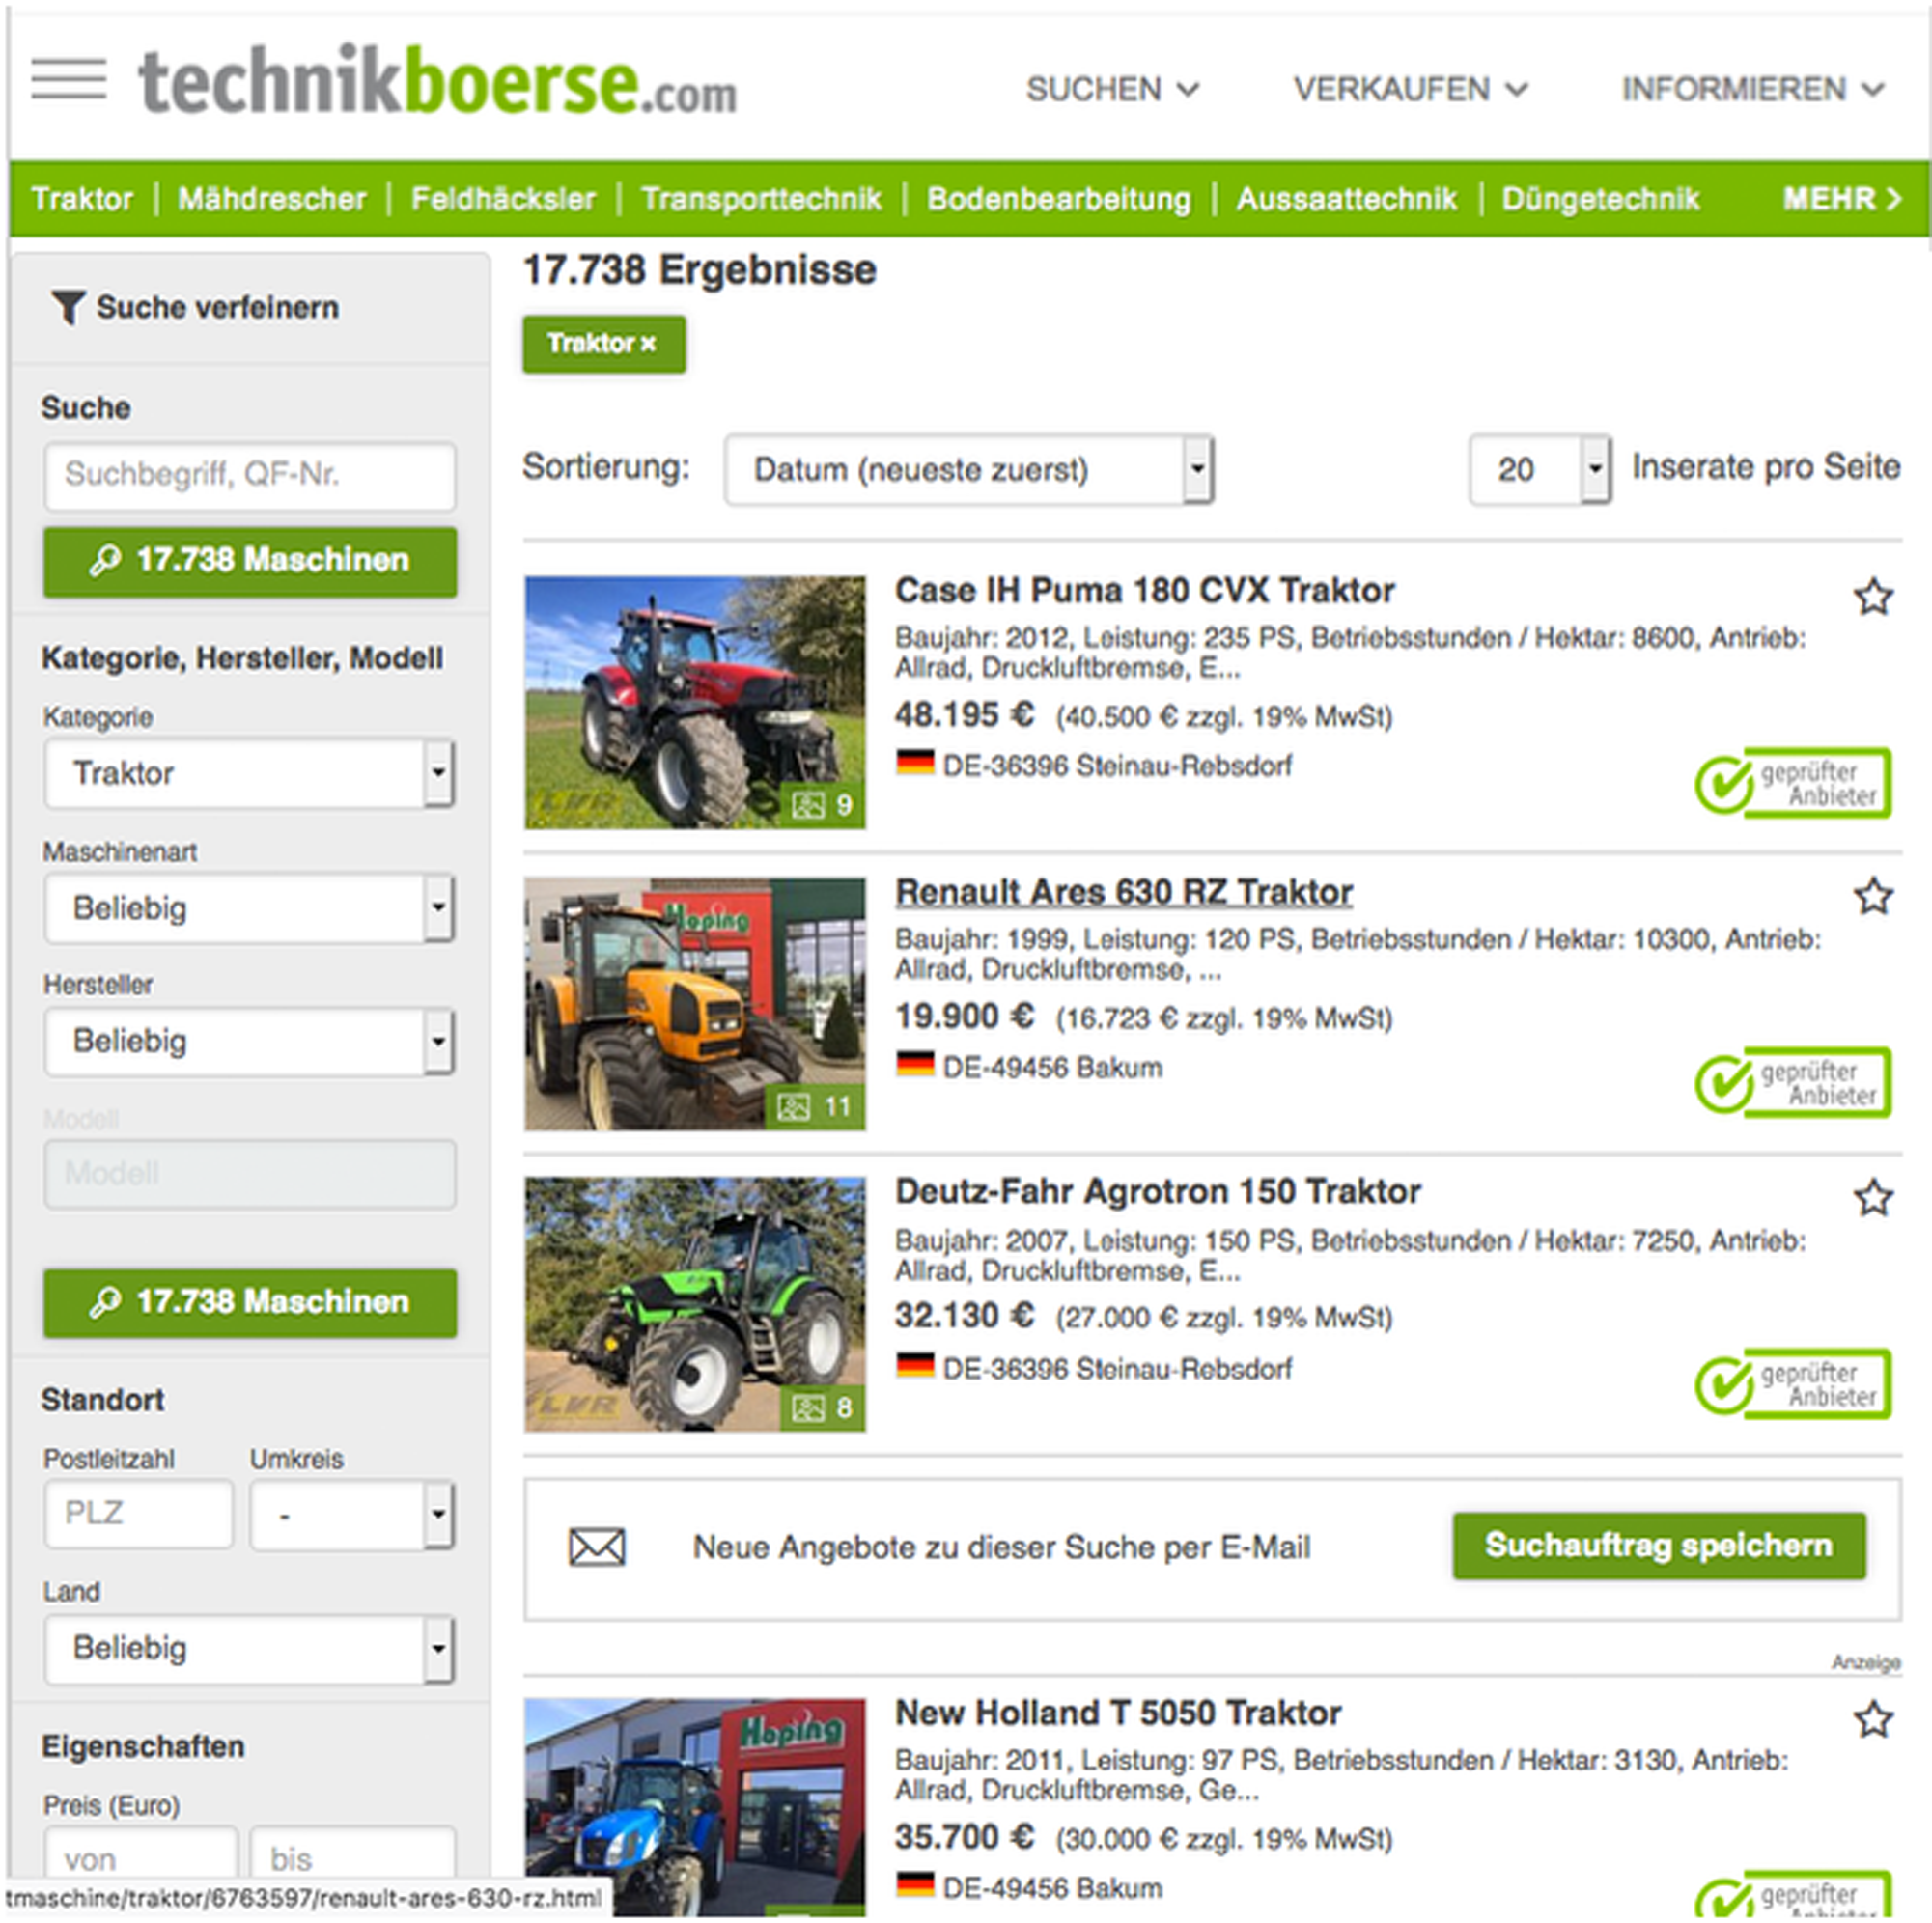 technikboerse.com|copyright: technikboerse.com